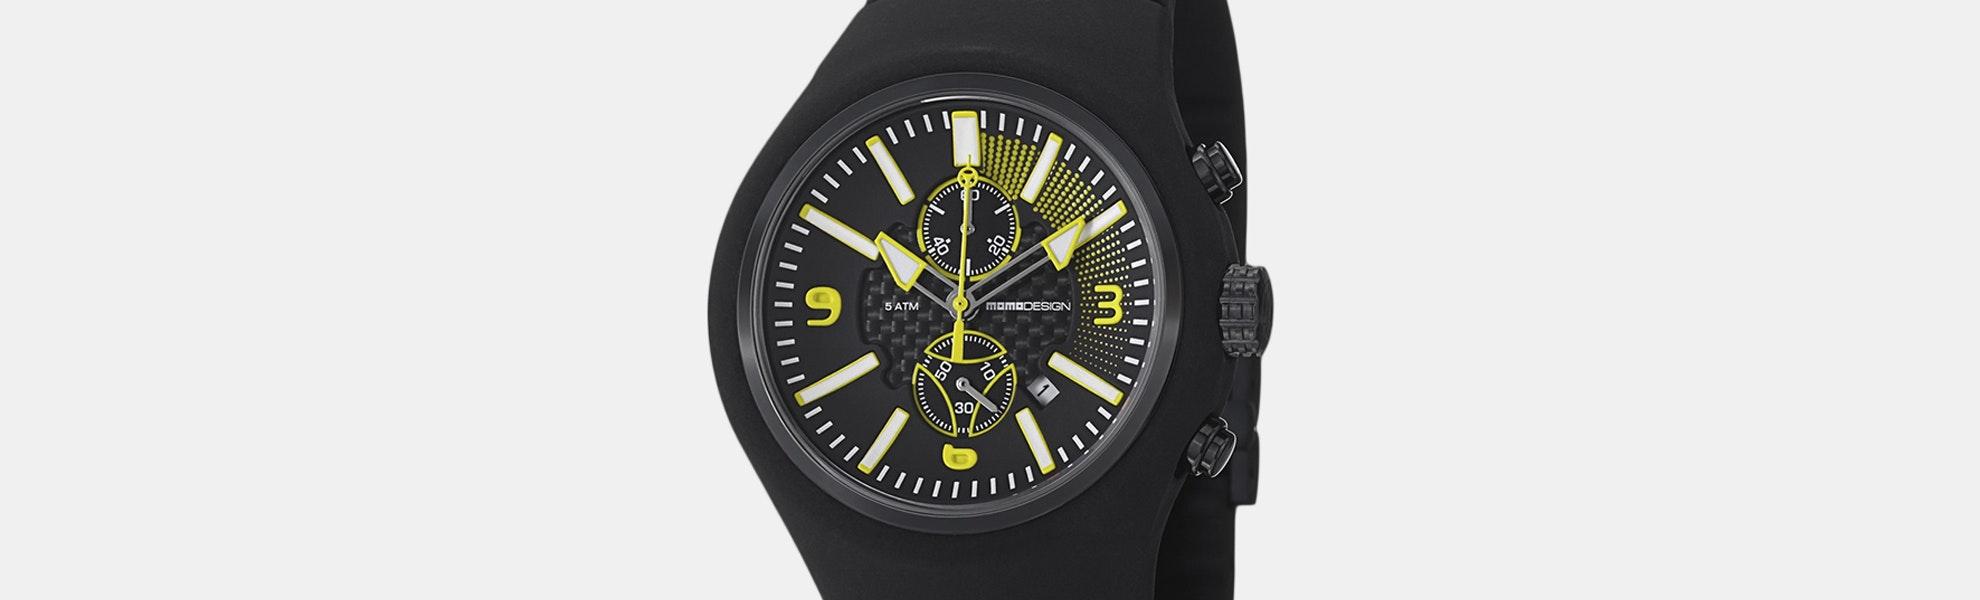 Momo Design Mirage Chronograph Quartz Watch